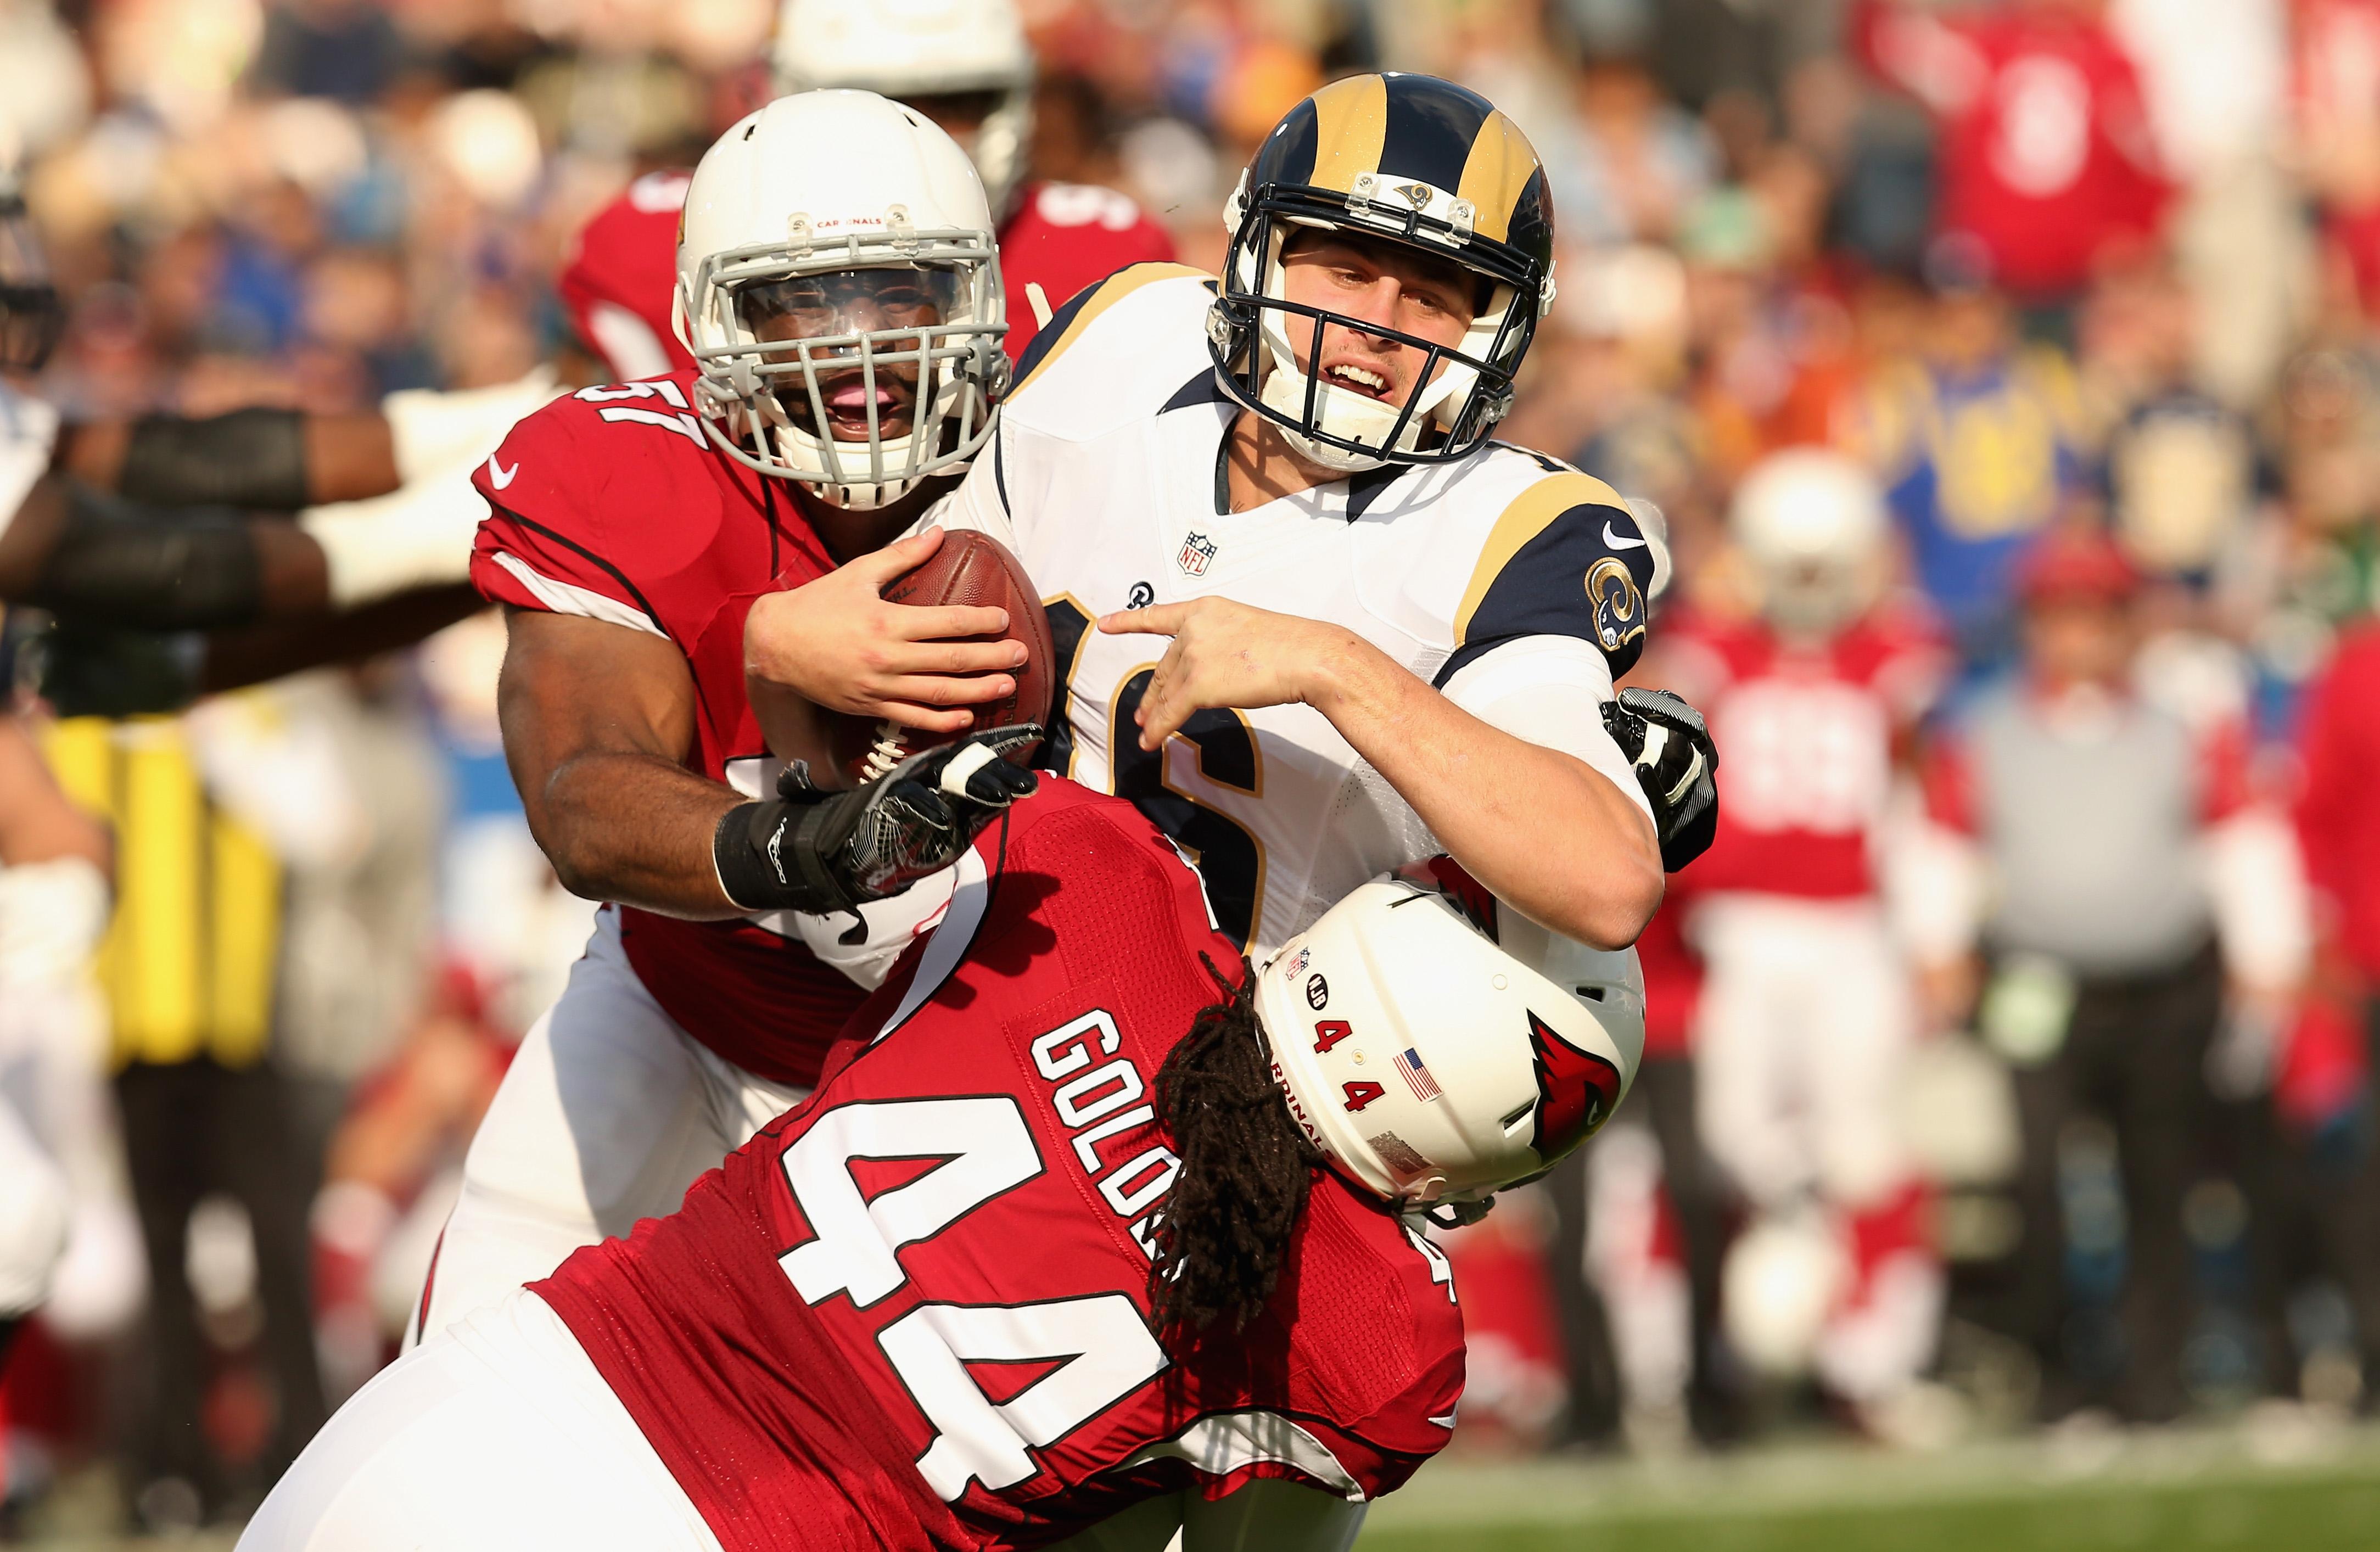 Los Angeles Rams QB Jared Goff sacked